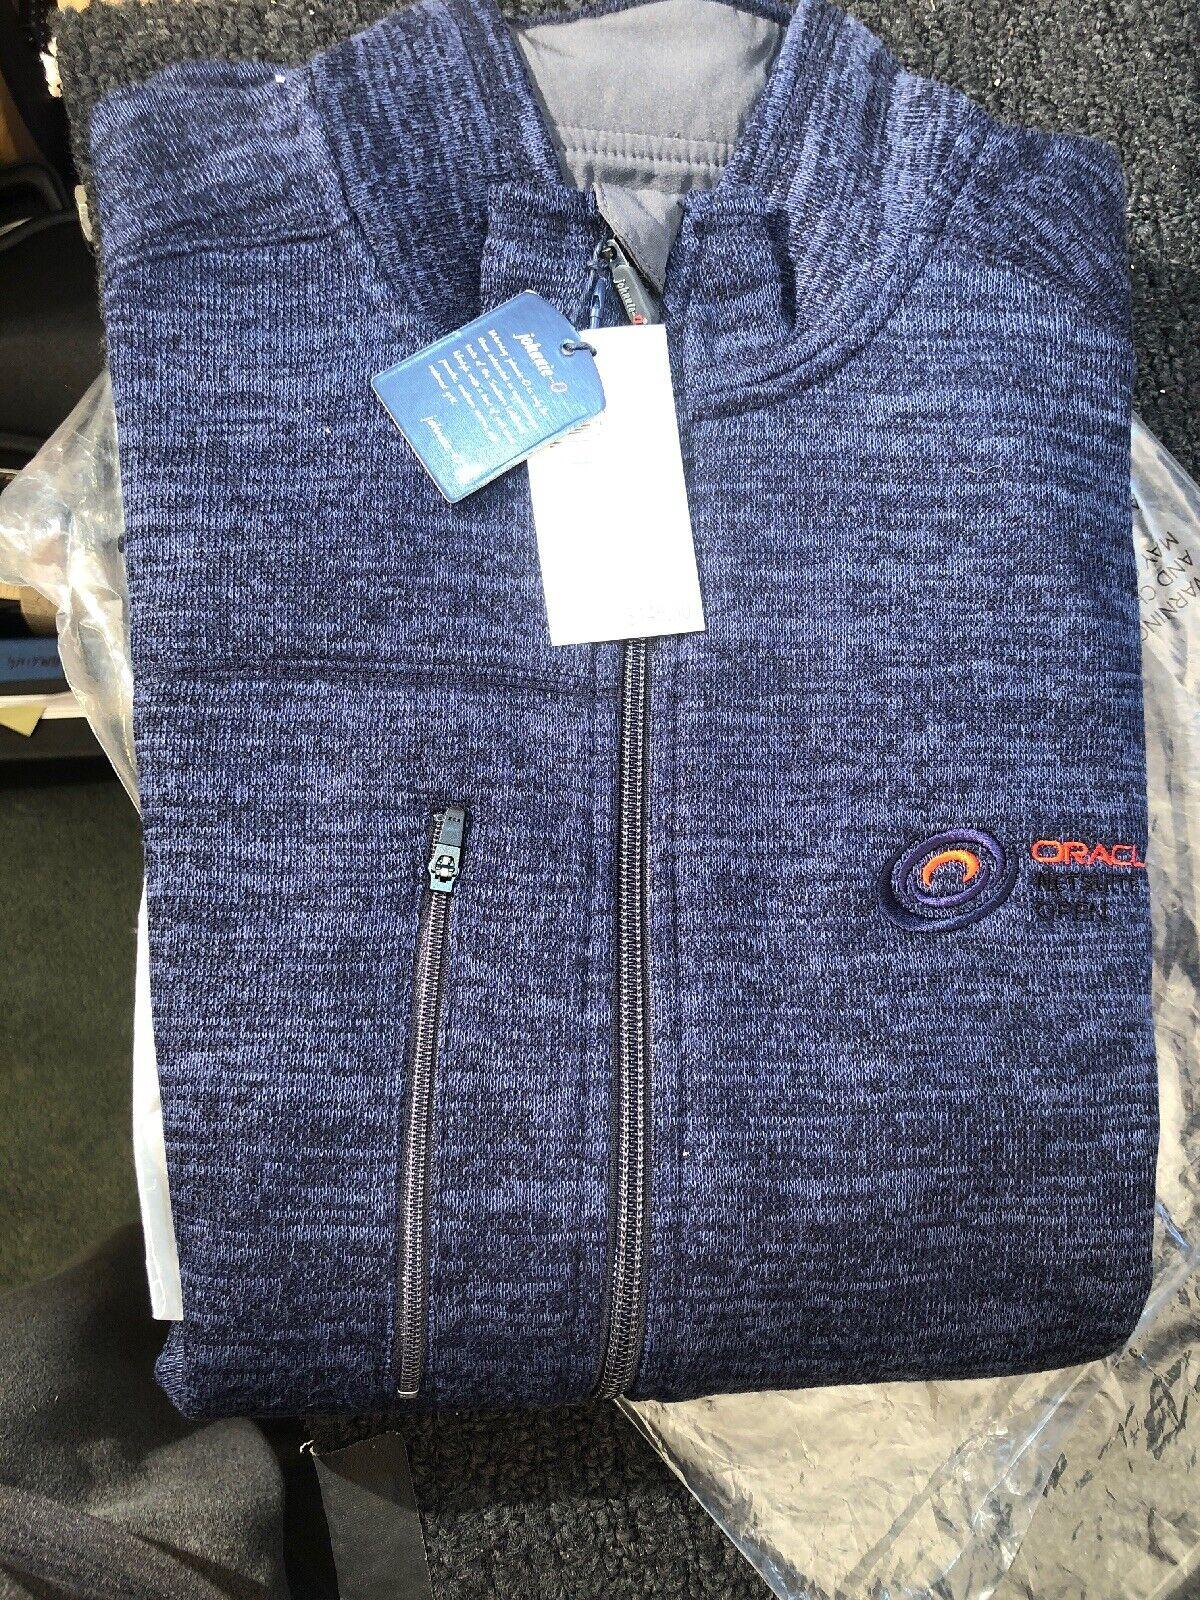 Jonnie-O JMVT1100 Tahoe Farbe  409 ADMIRAL Vest